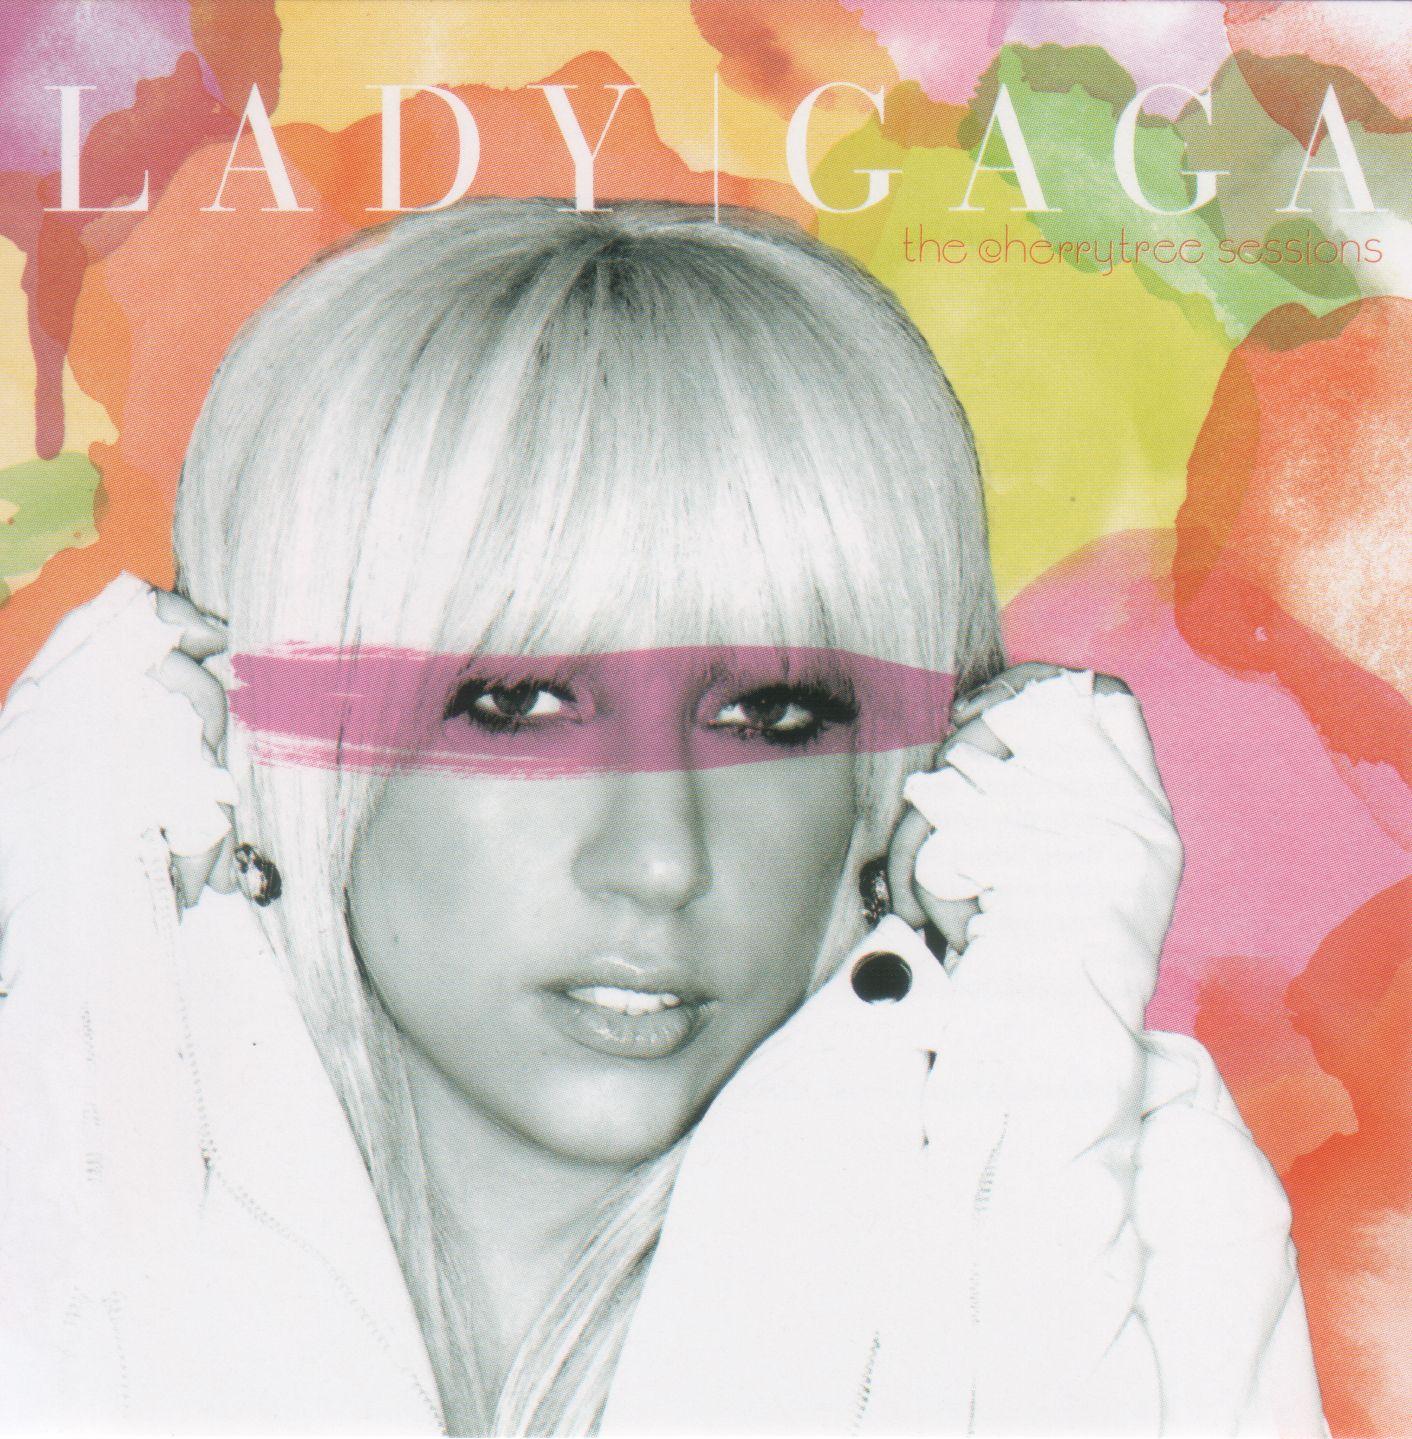 Lady GaGa - Cherrytree Sessions album cover